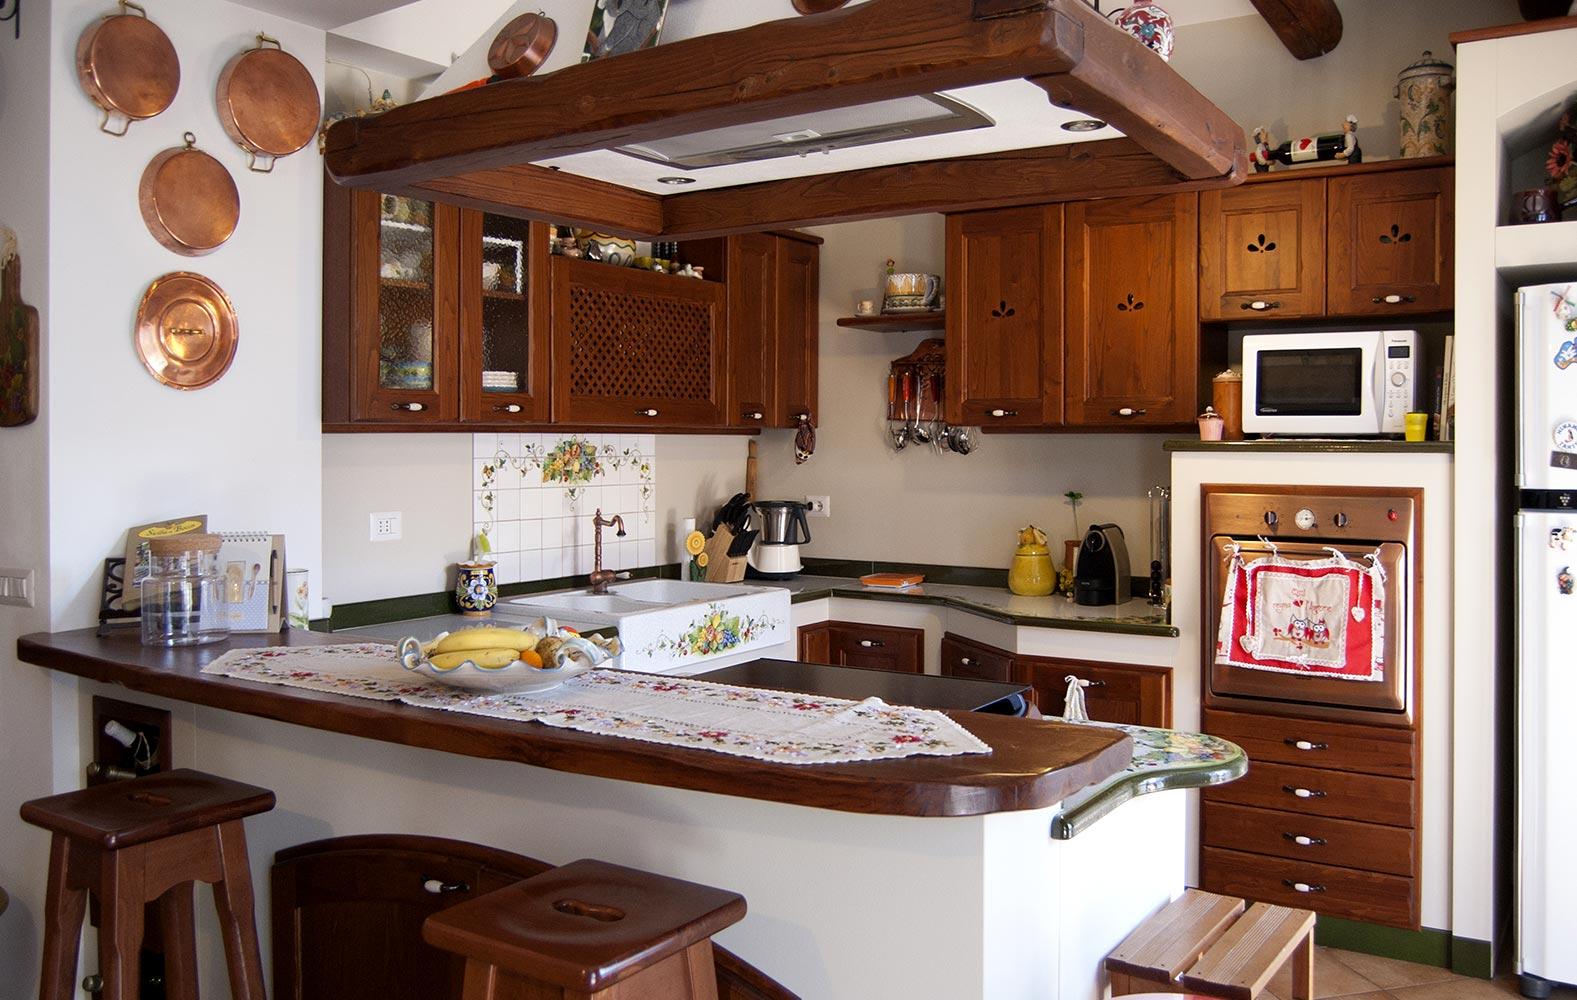 Cucine moderne ecologiche in muratura smontabile modello - Modelli di cucina in muratura ...